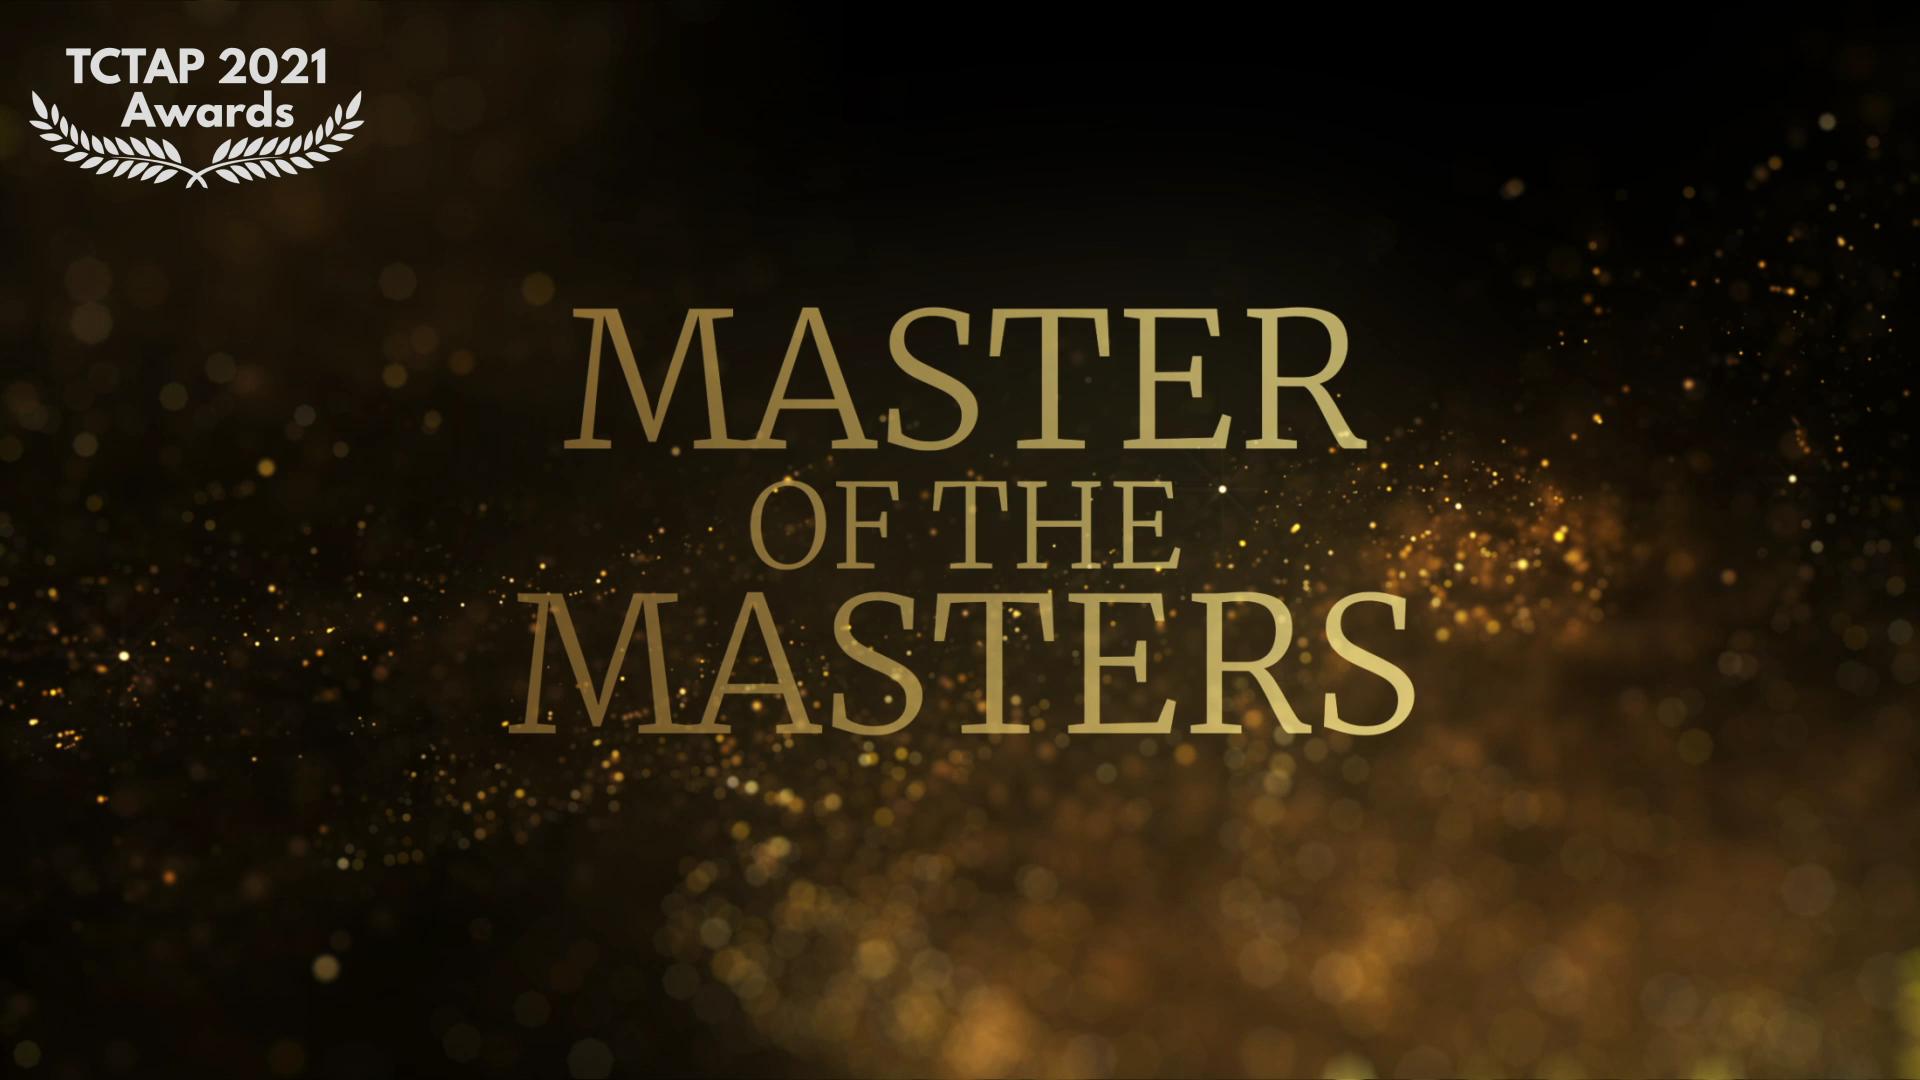 [TCTAP 2021 Virtual] TCTAP Award 2021 - Master of the Masters